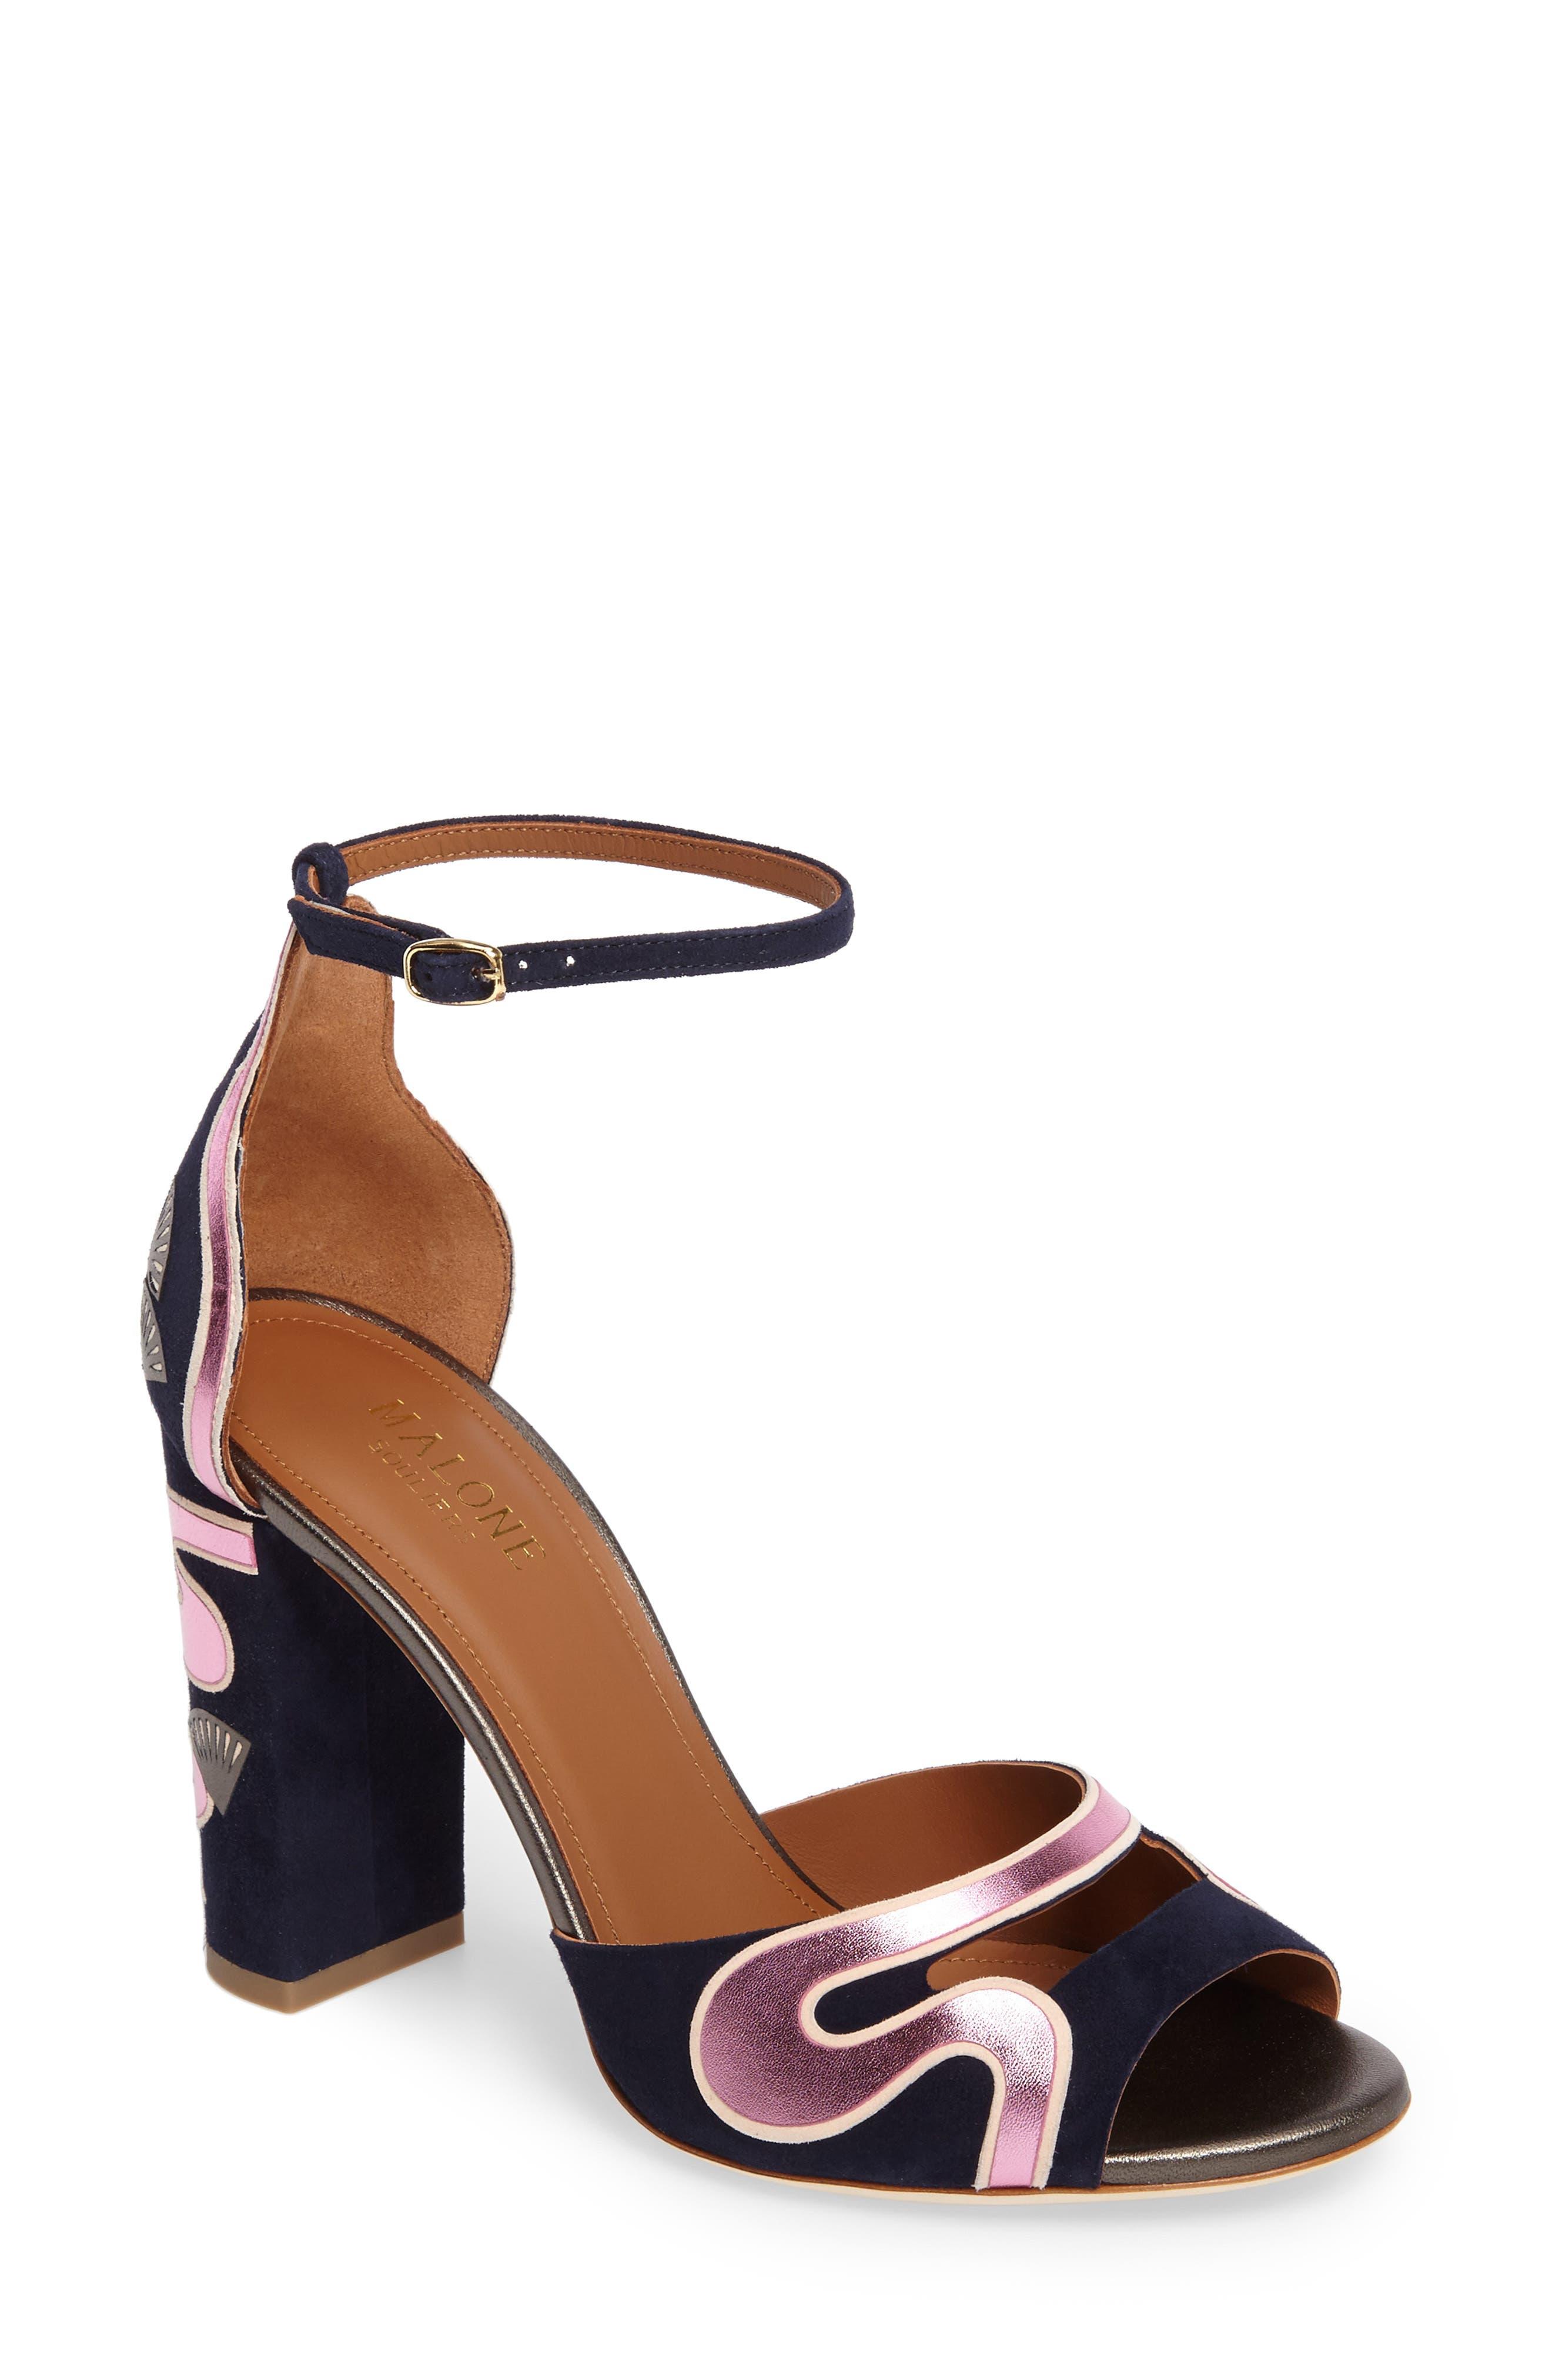 Nina Chunky Heel Sandal,                             Main thumbnail 1, color,                             Midnight Navy/ Pink